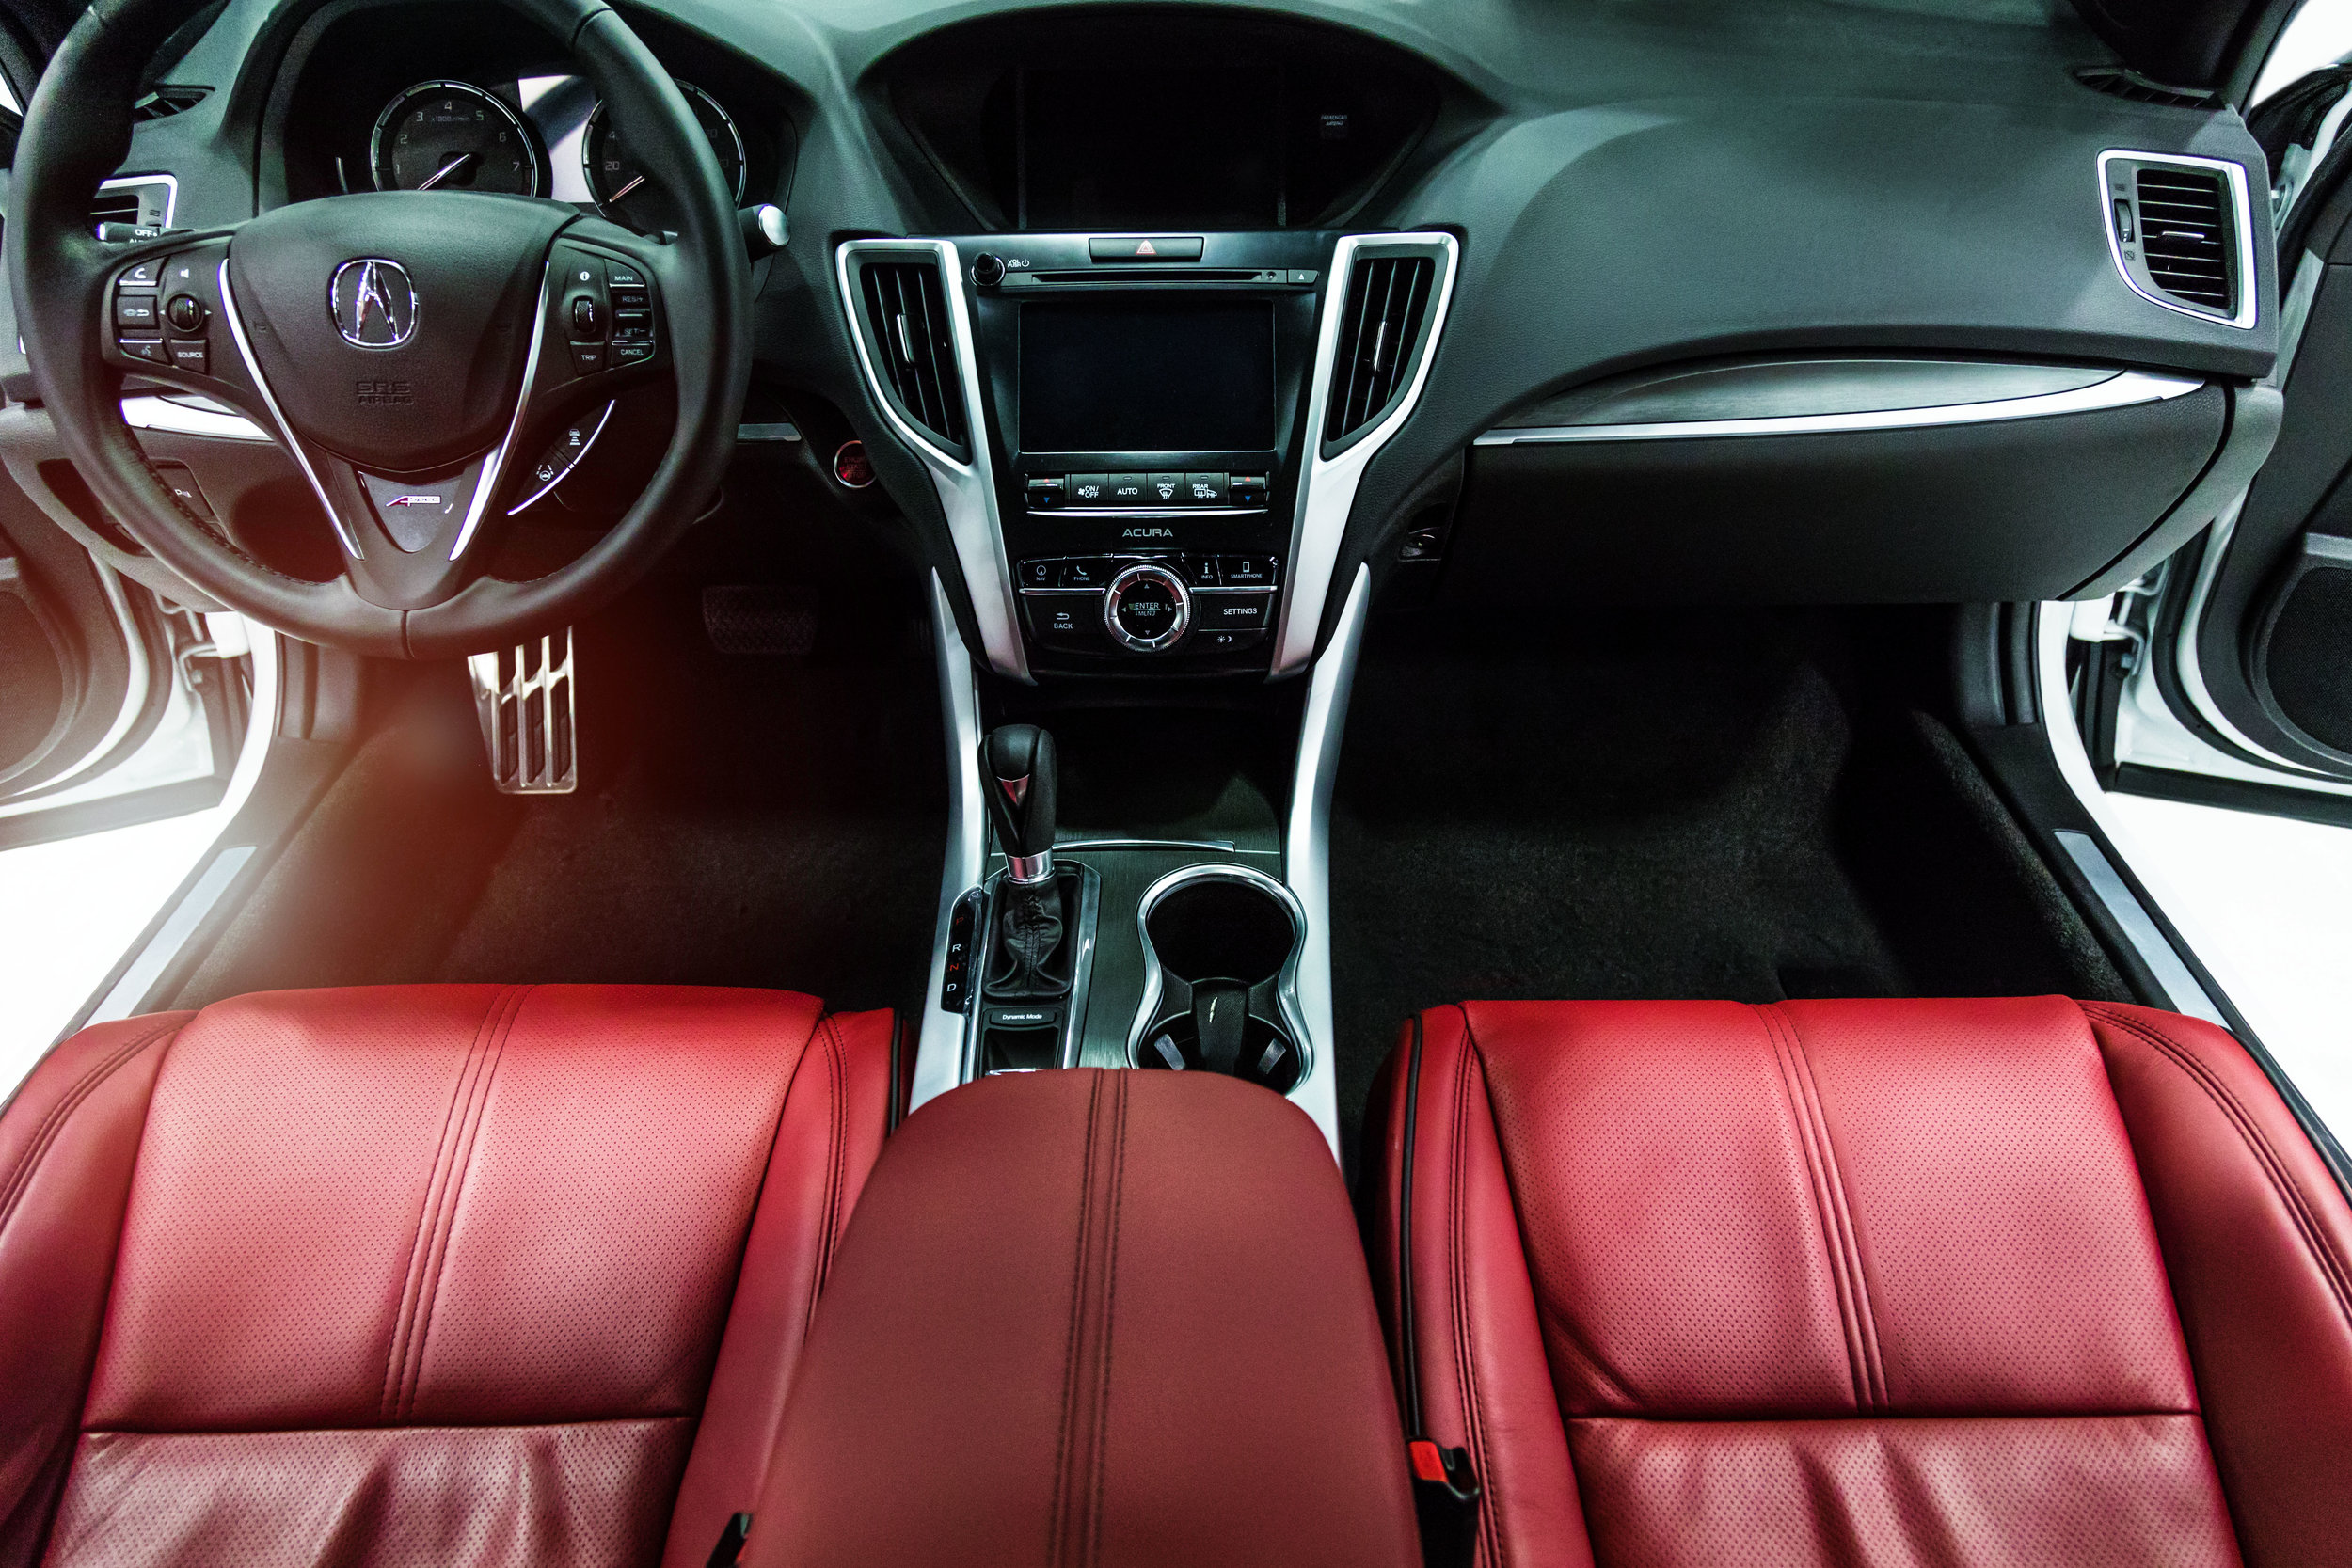 1H4A5496_Nissan+interior.jpg